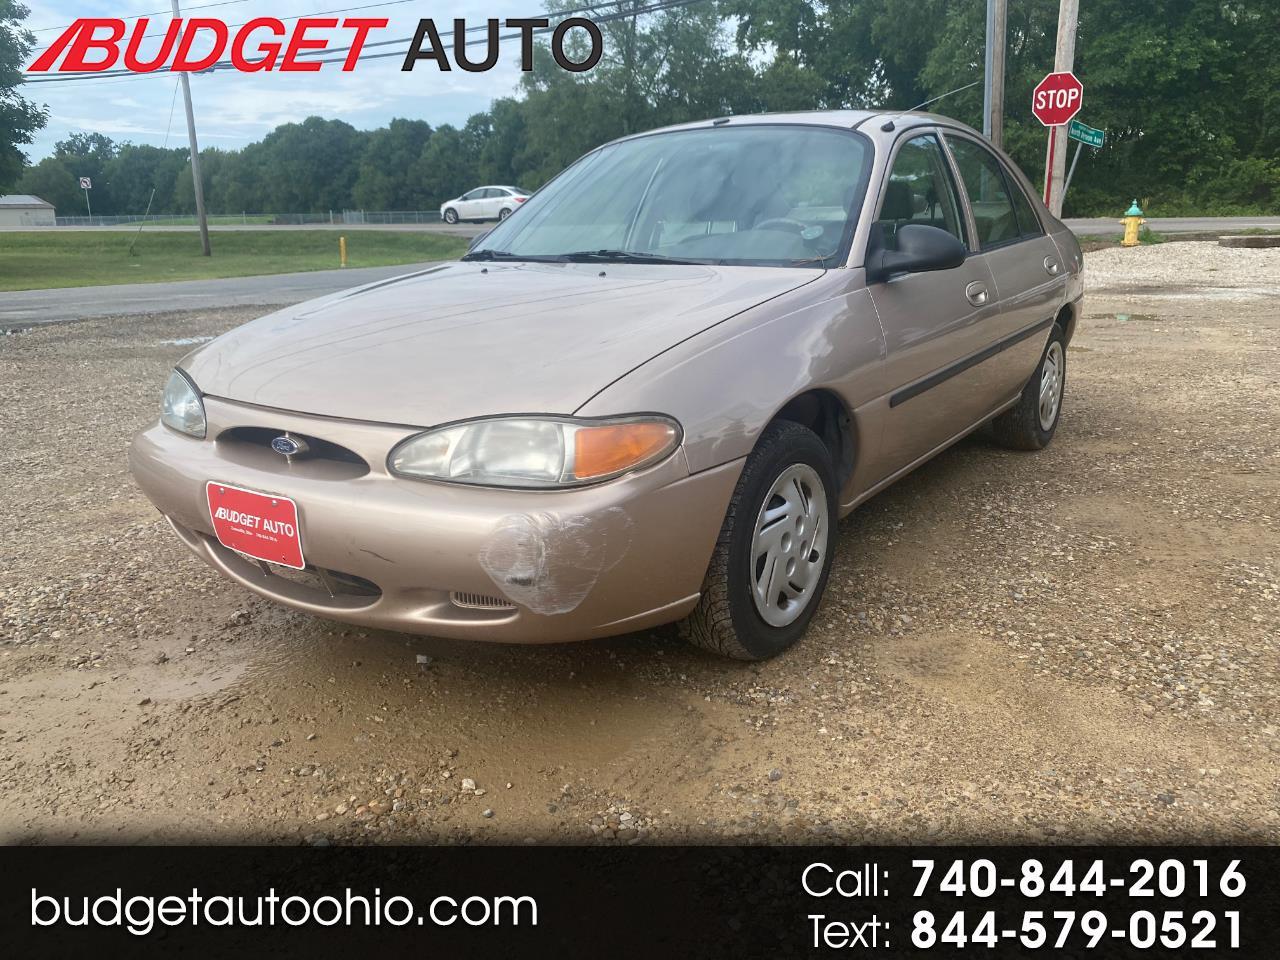 Ford Escort LX 1999